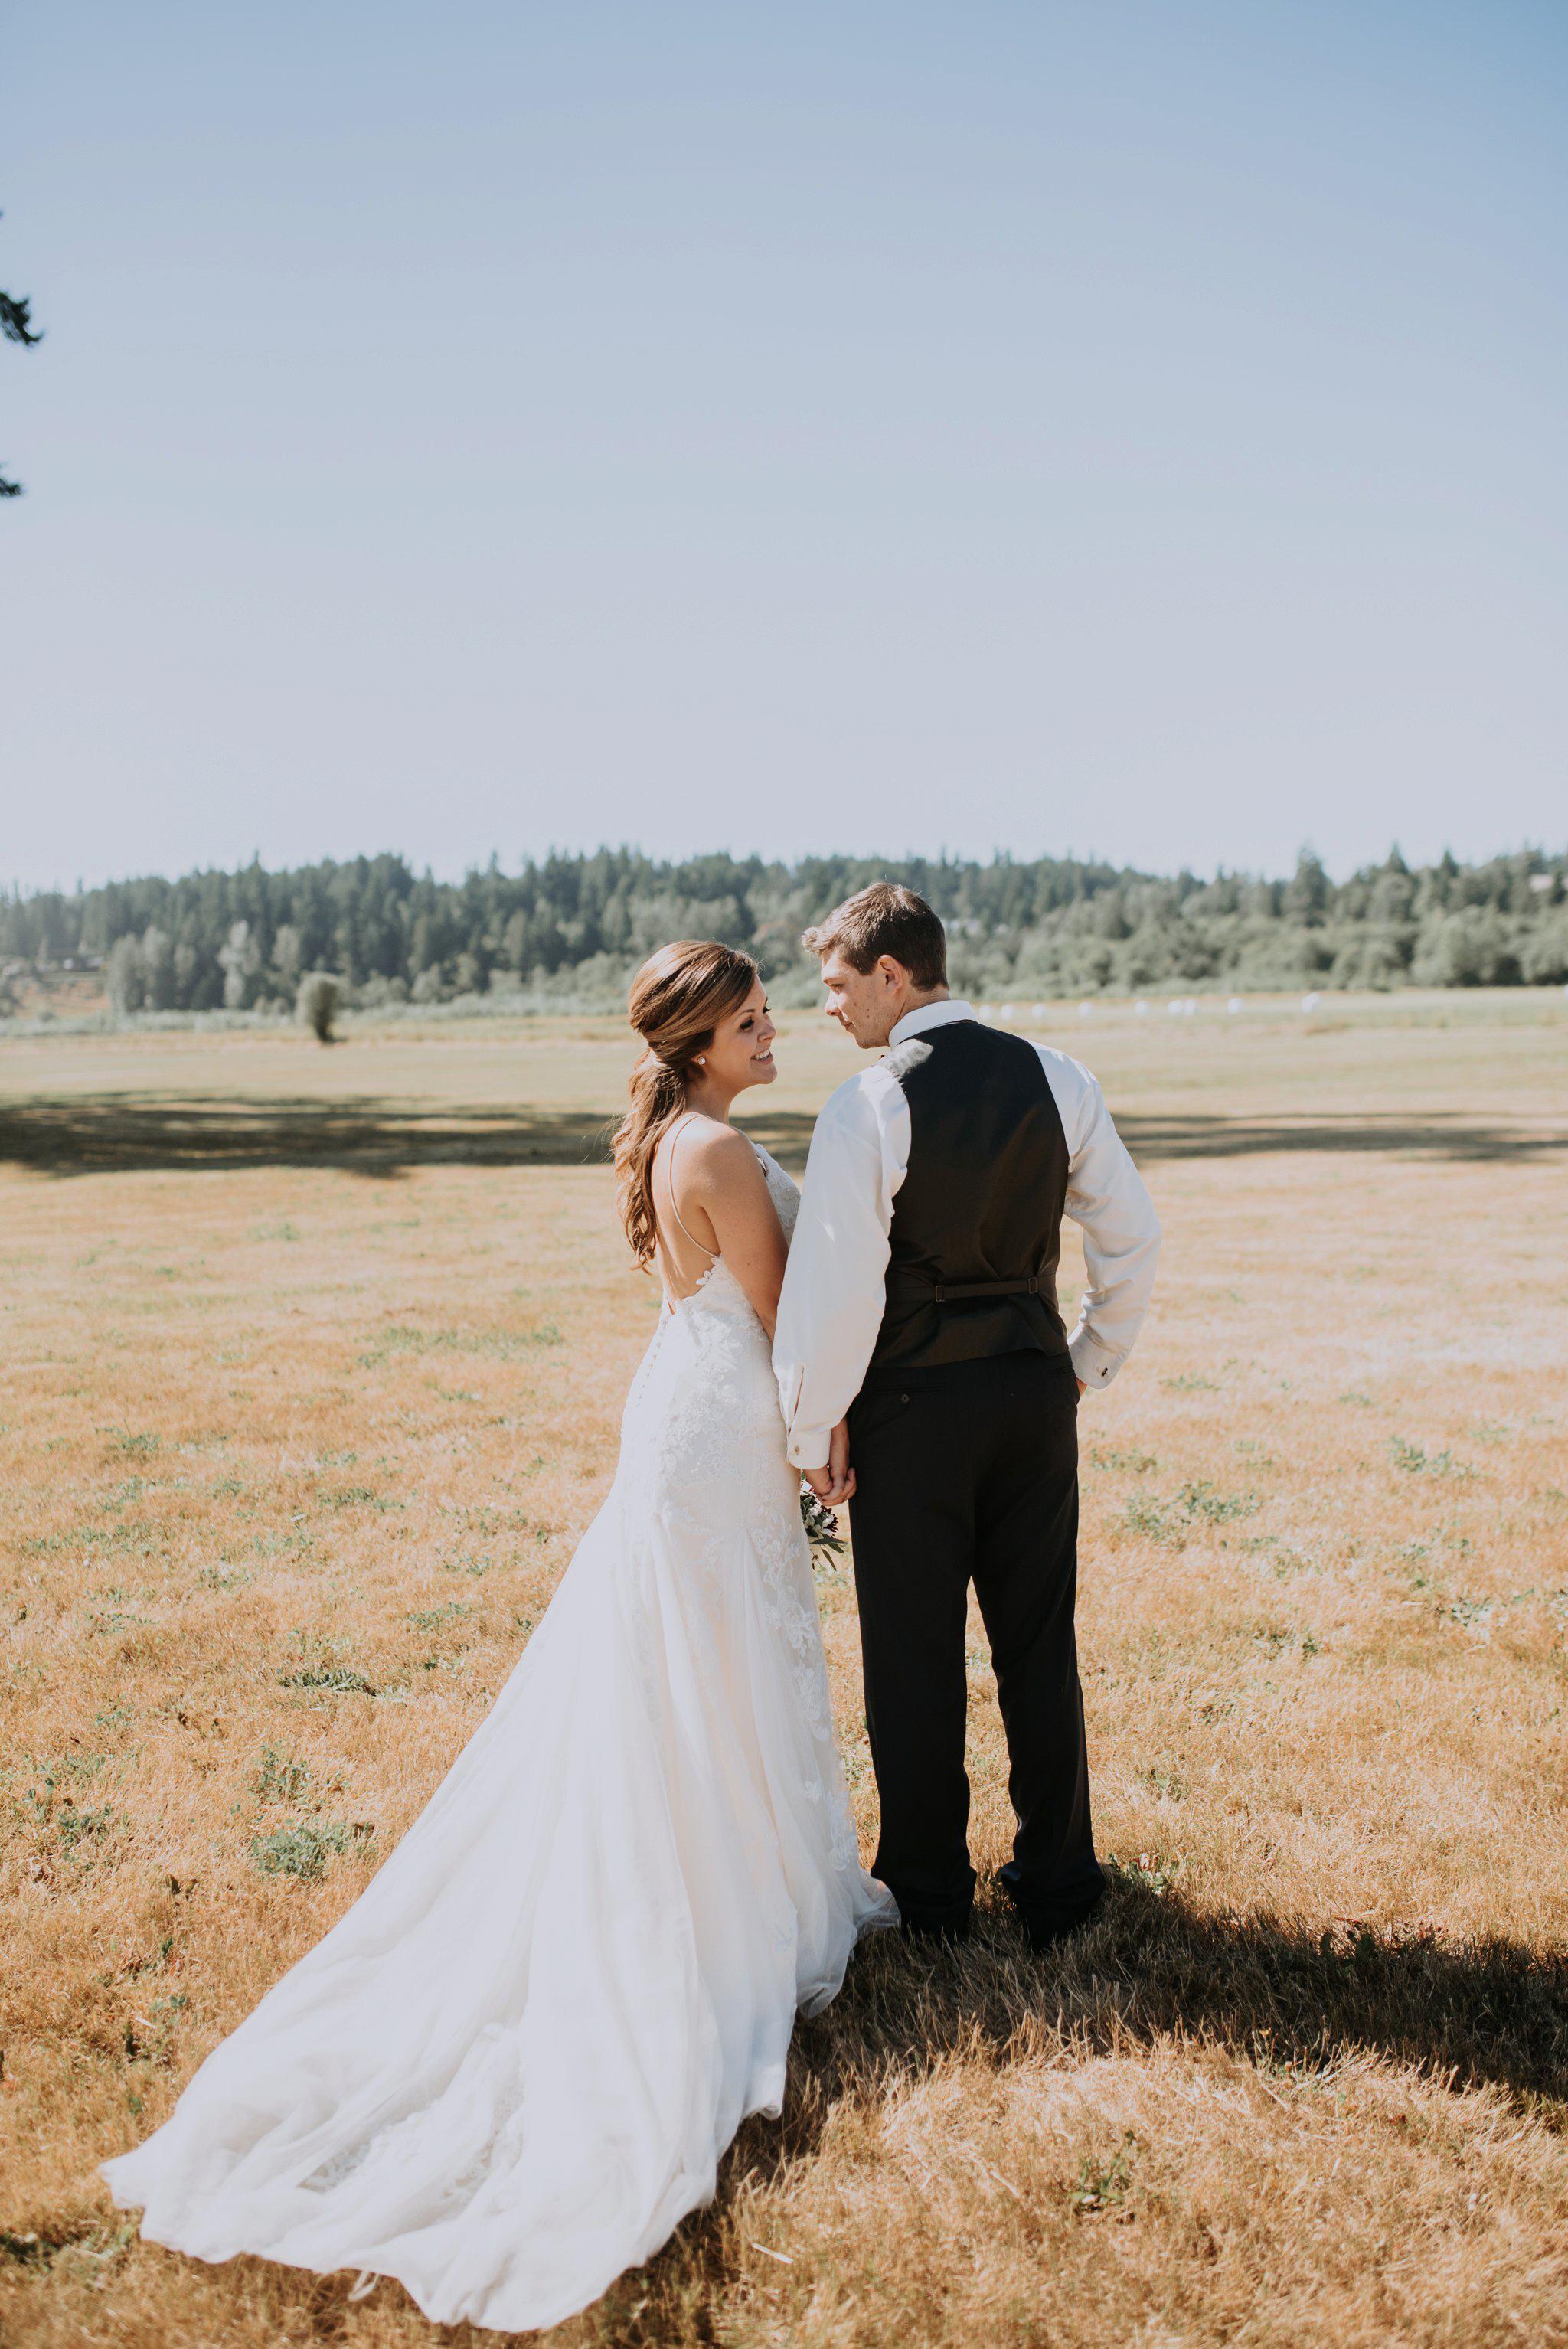 kristen-and-cody-the-kelley-farm-wedding-seattle-photographer-caitlyn-nikula-45.jpg